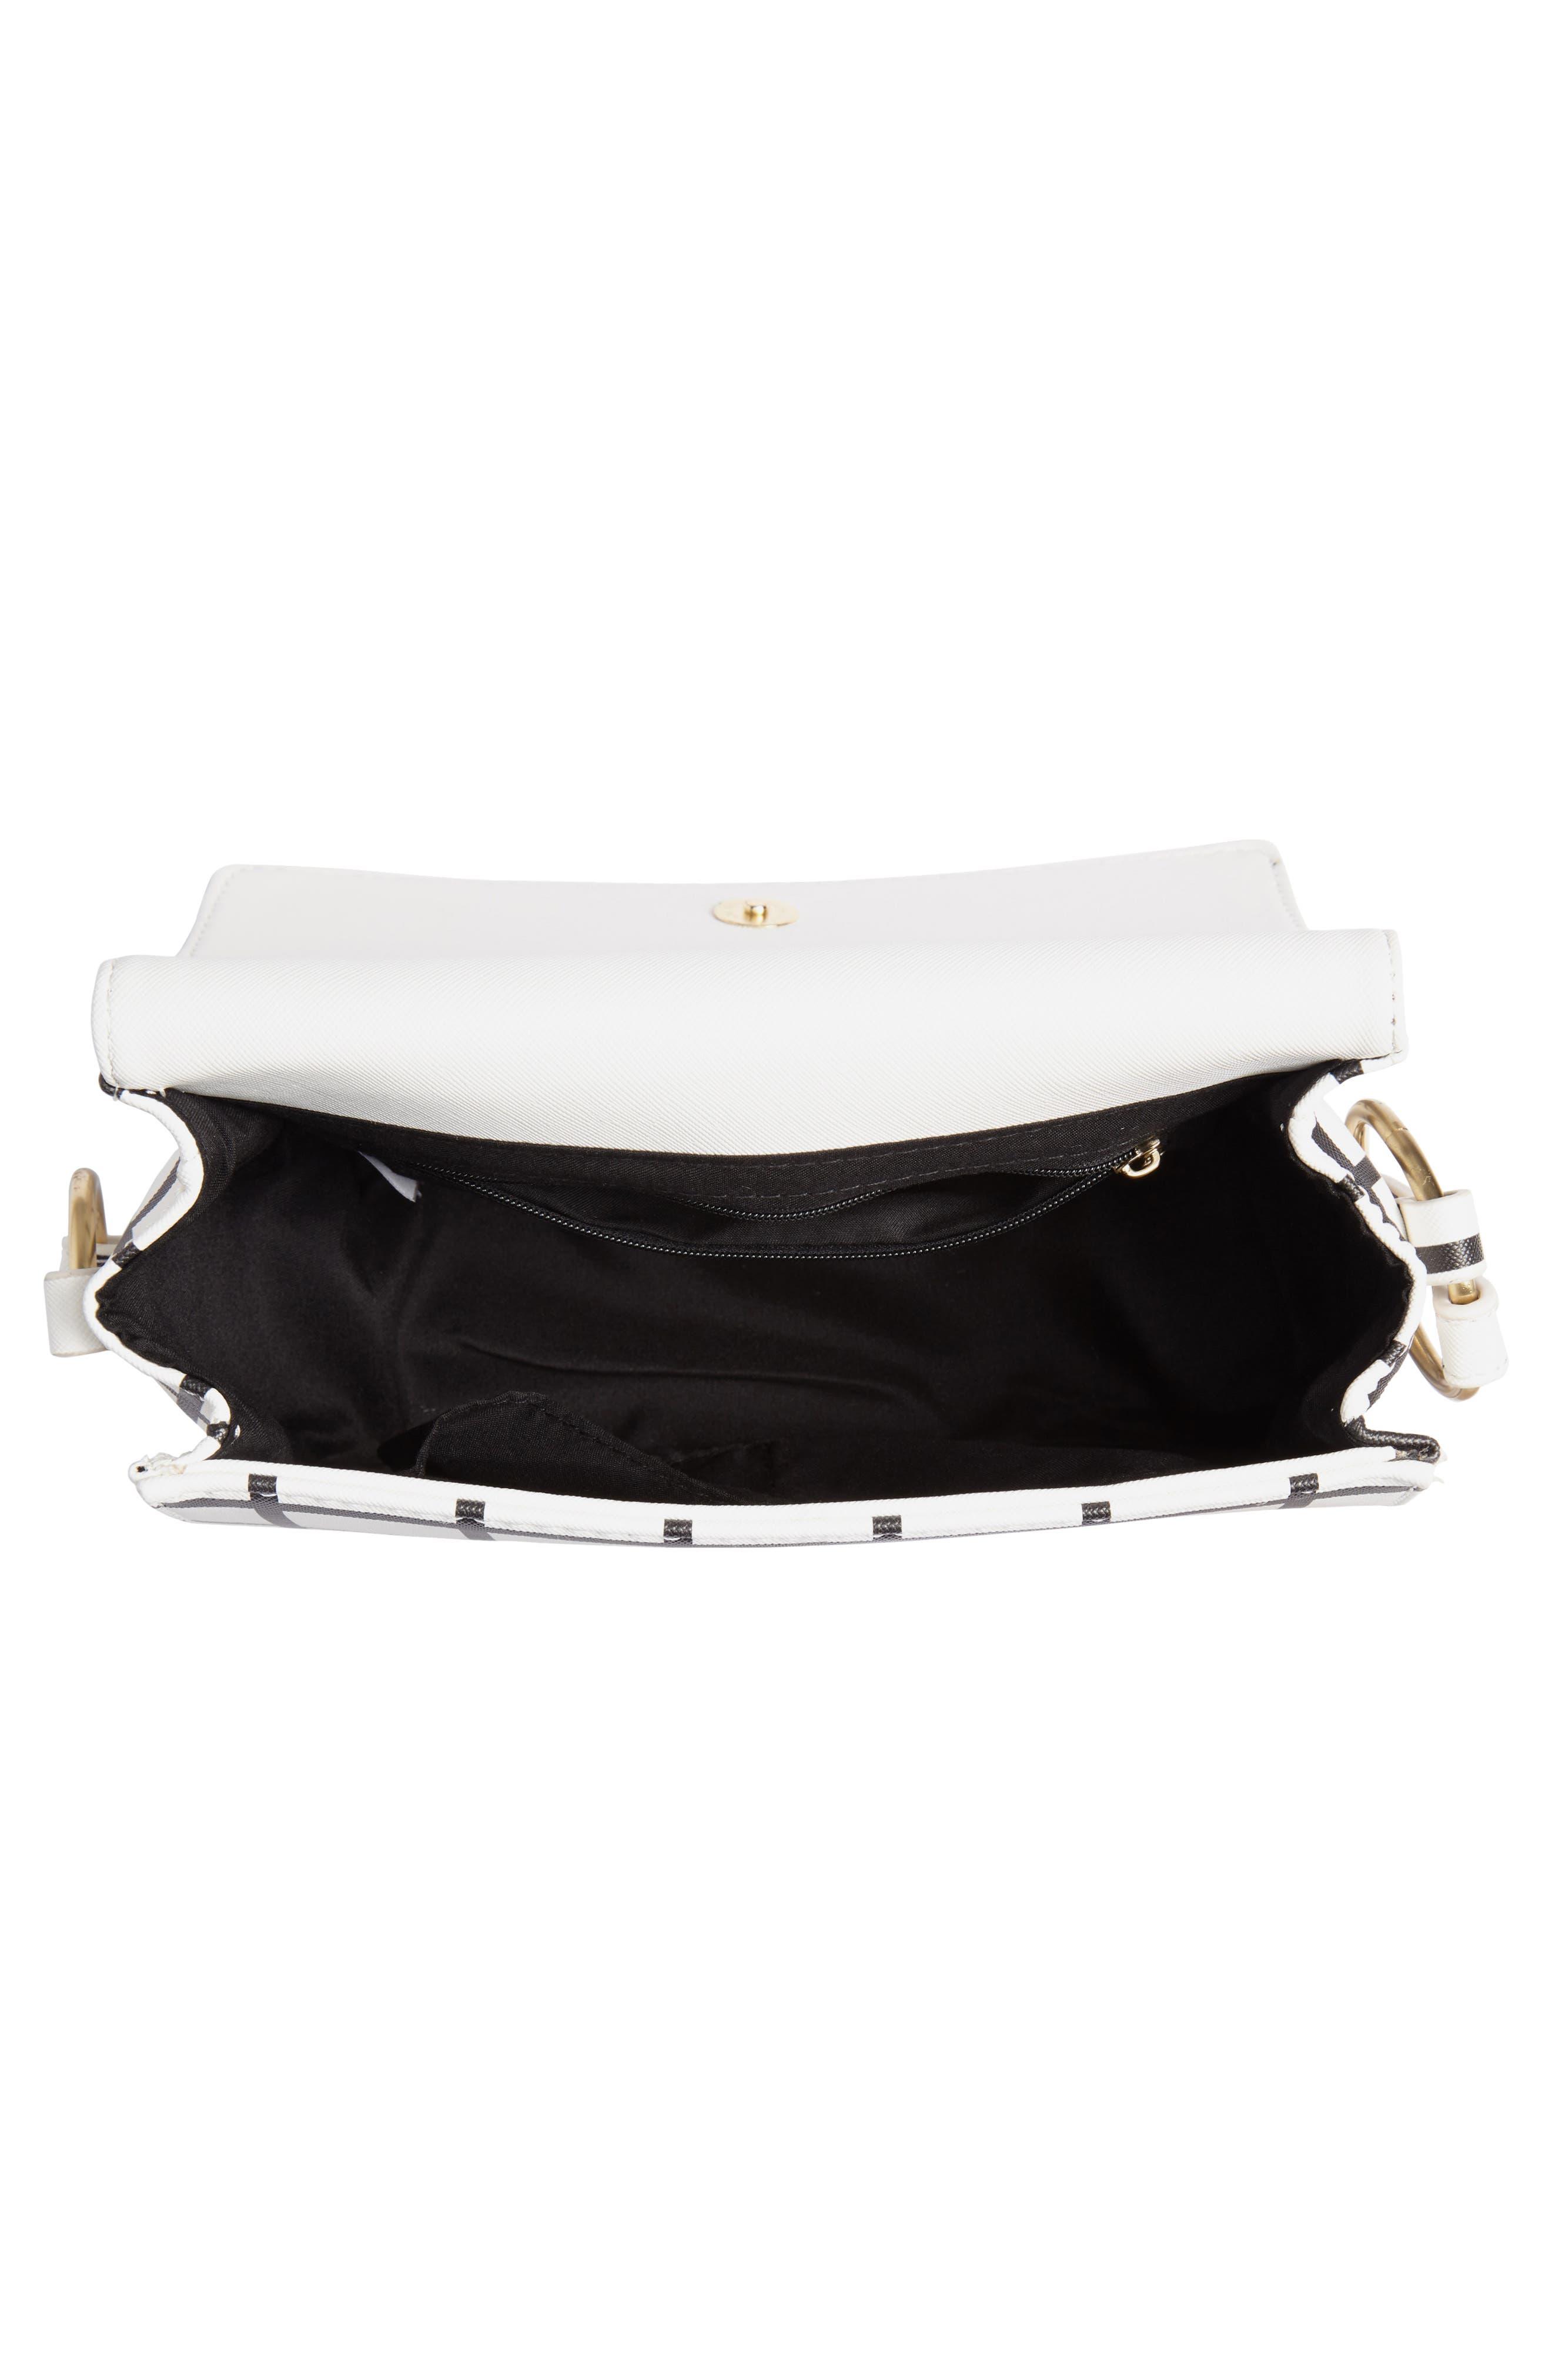 Windowpane Check Faux Leather Crossbody Bag,                             Alternate thumbnail 4, color,                             BLACK/ WHITE